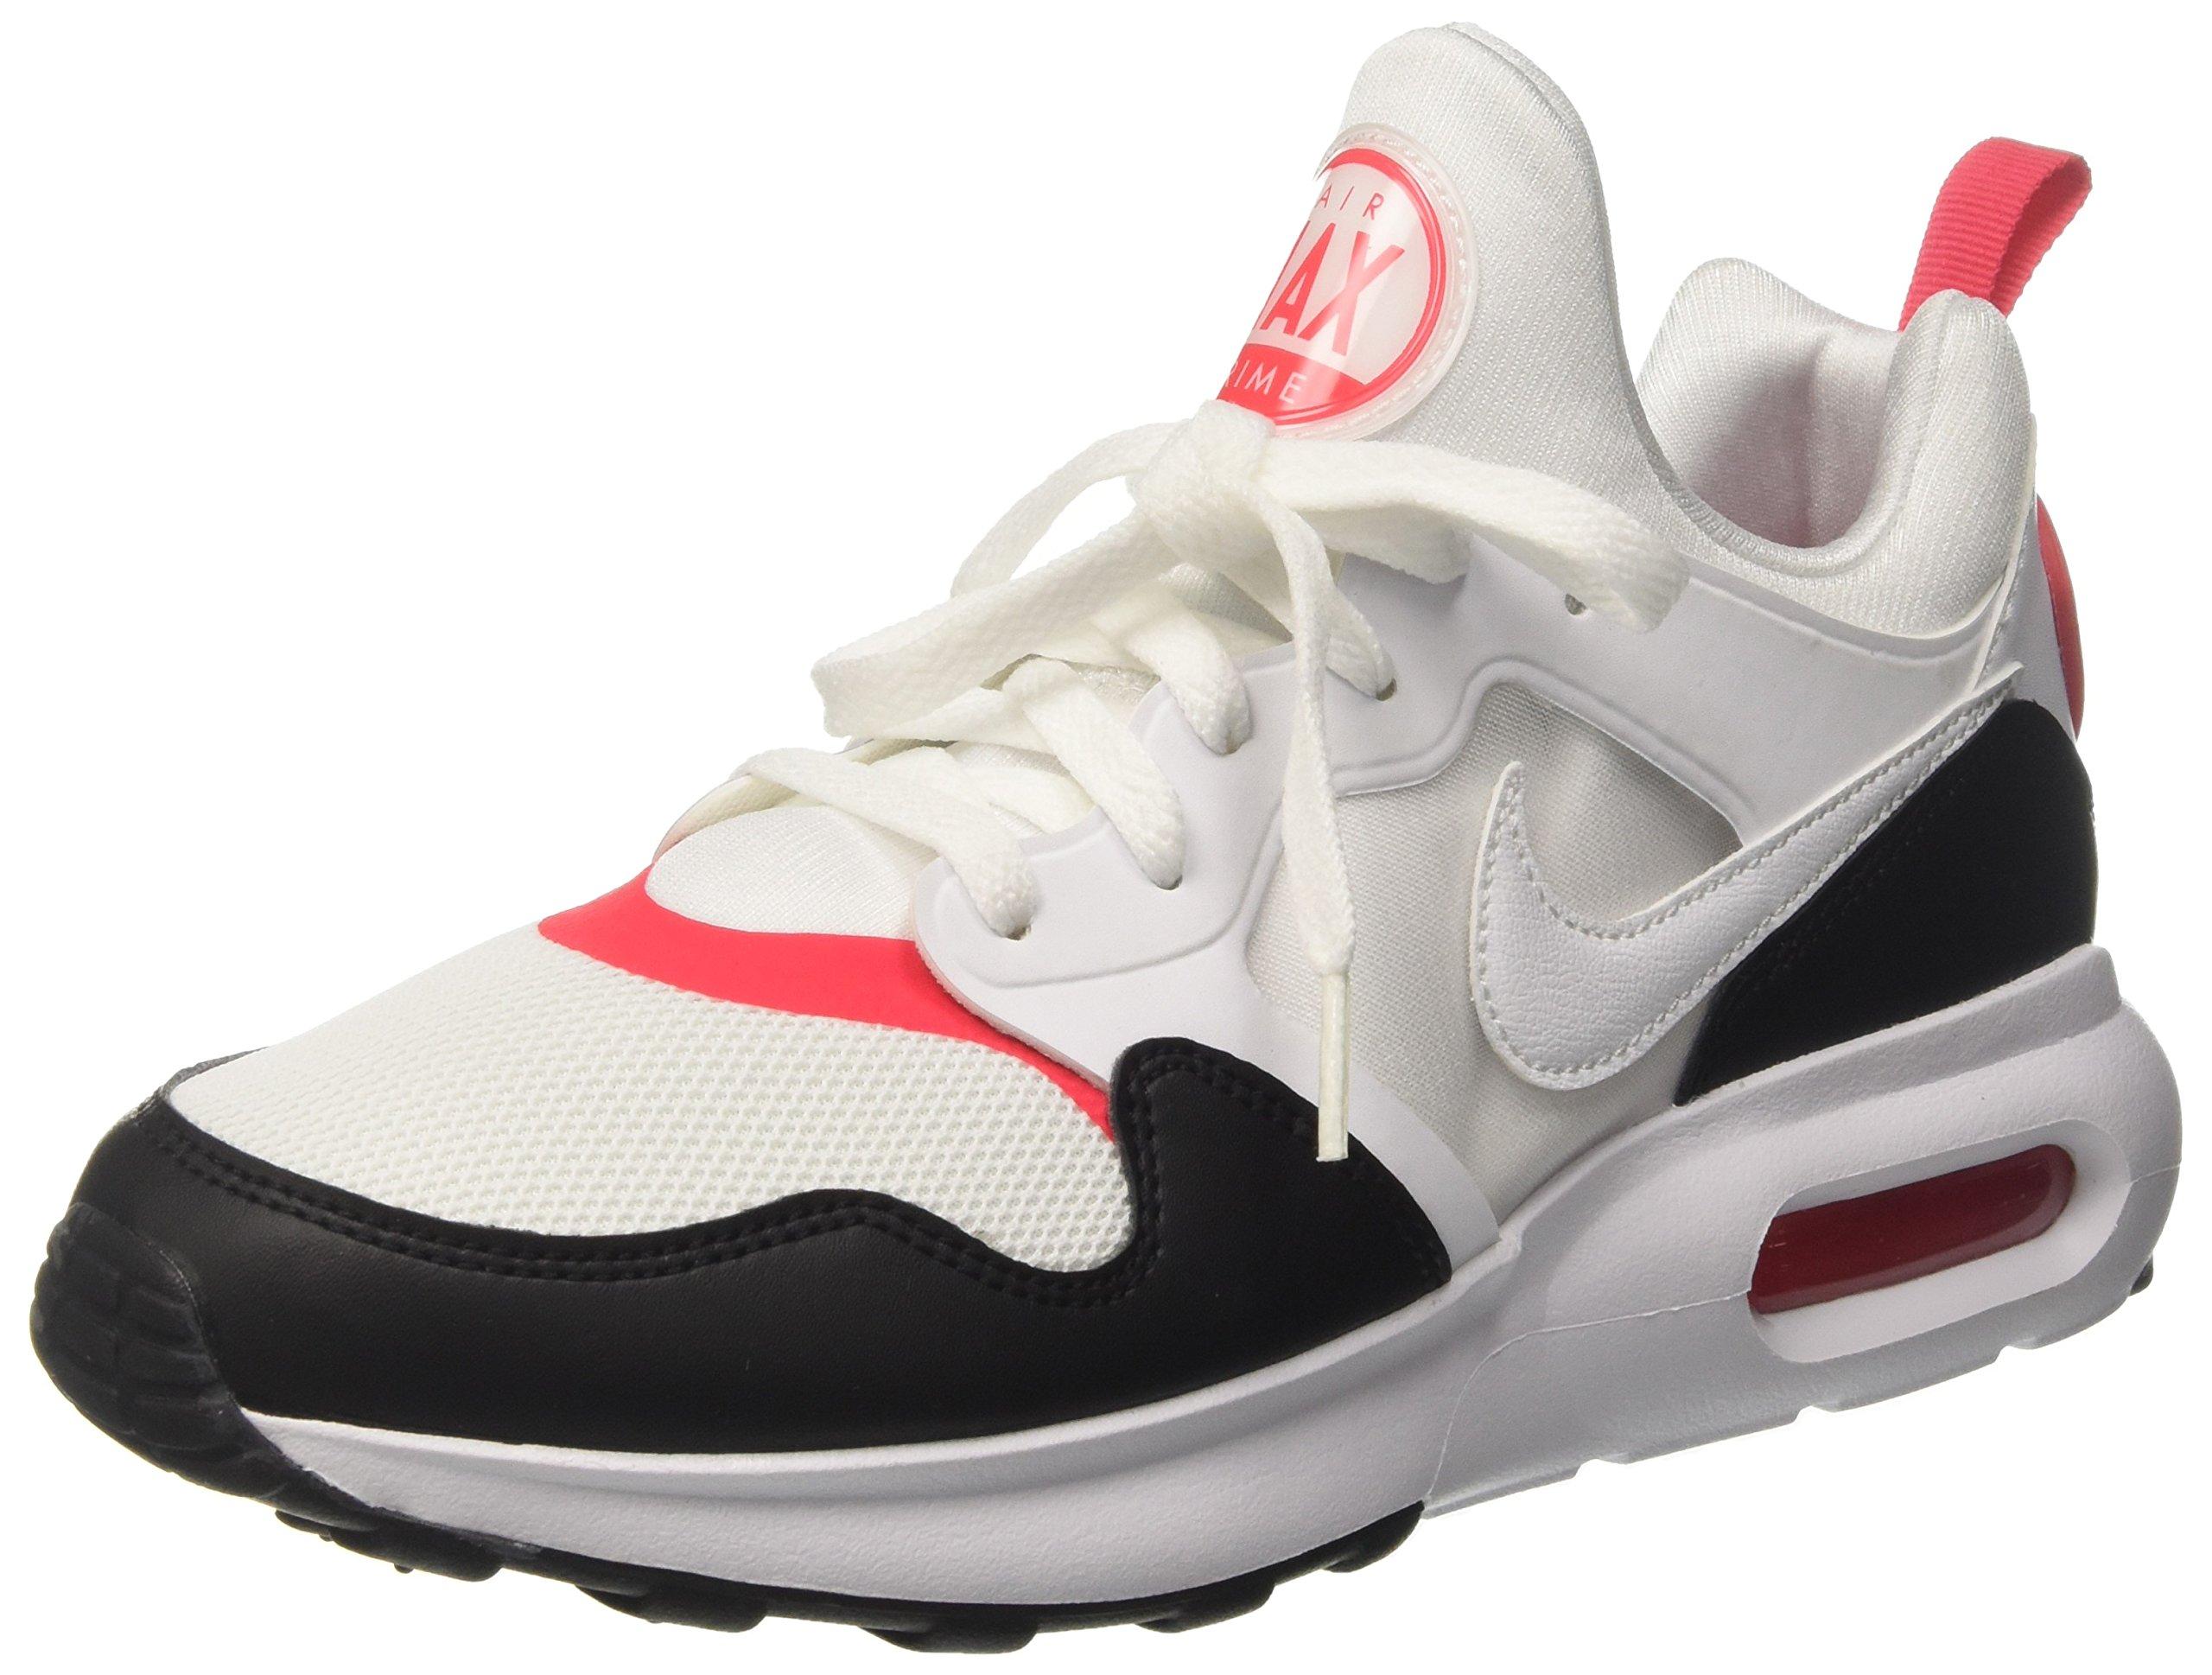 d16f99e92ac8a Galleon - Nike Men's Air Max Prime White/White Siren Red Black Running Shoe  9 Men US